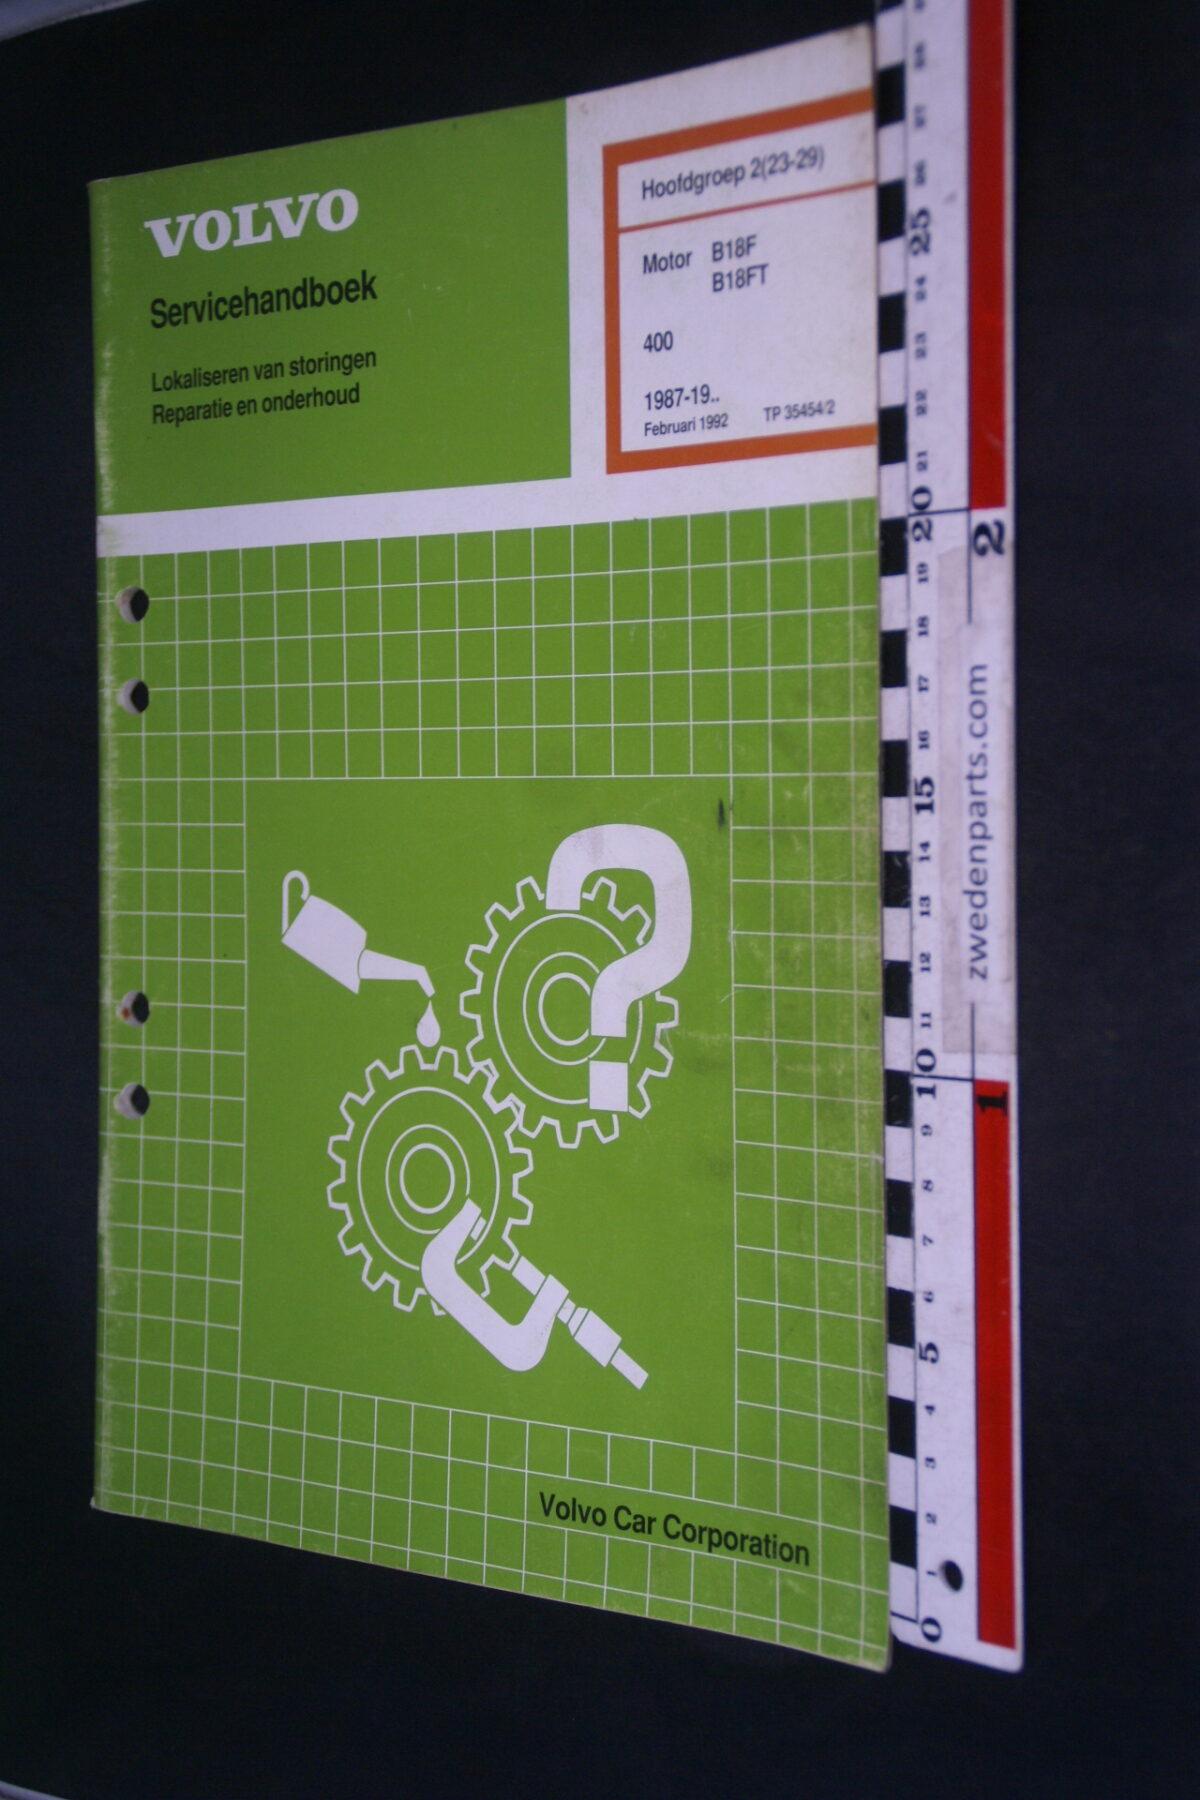 DSC09062 1992 origineel  Volvo 480 servicehandboek motor B18F B18FT 2 (23-29) 1 van 1.000 nr TP 354542